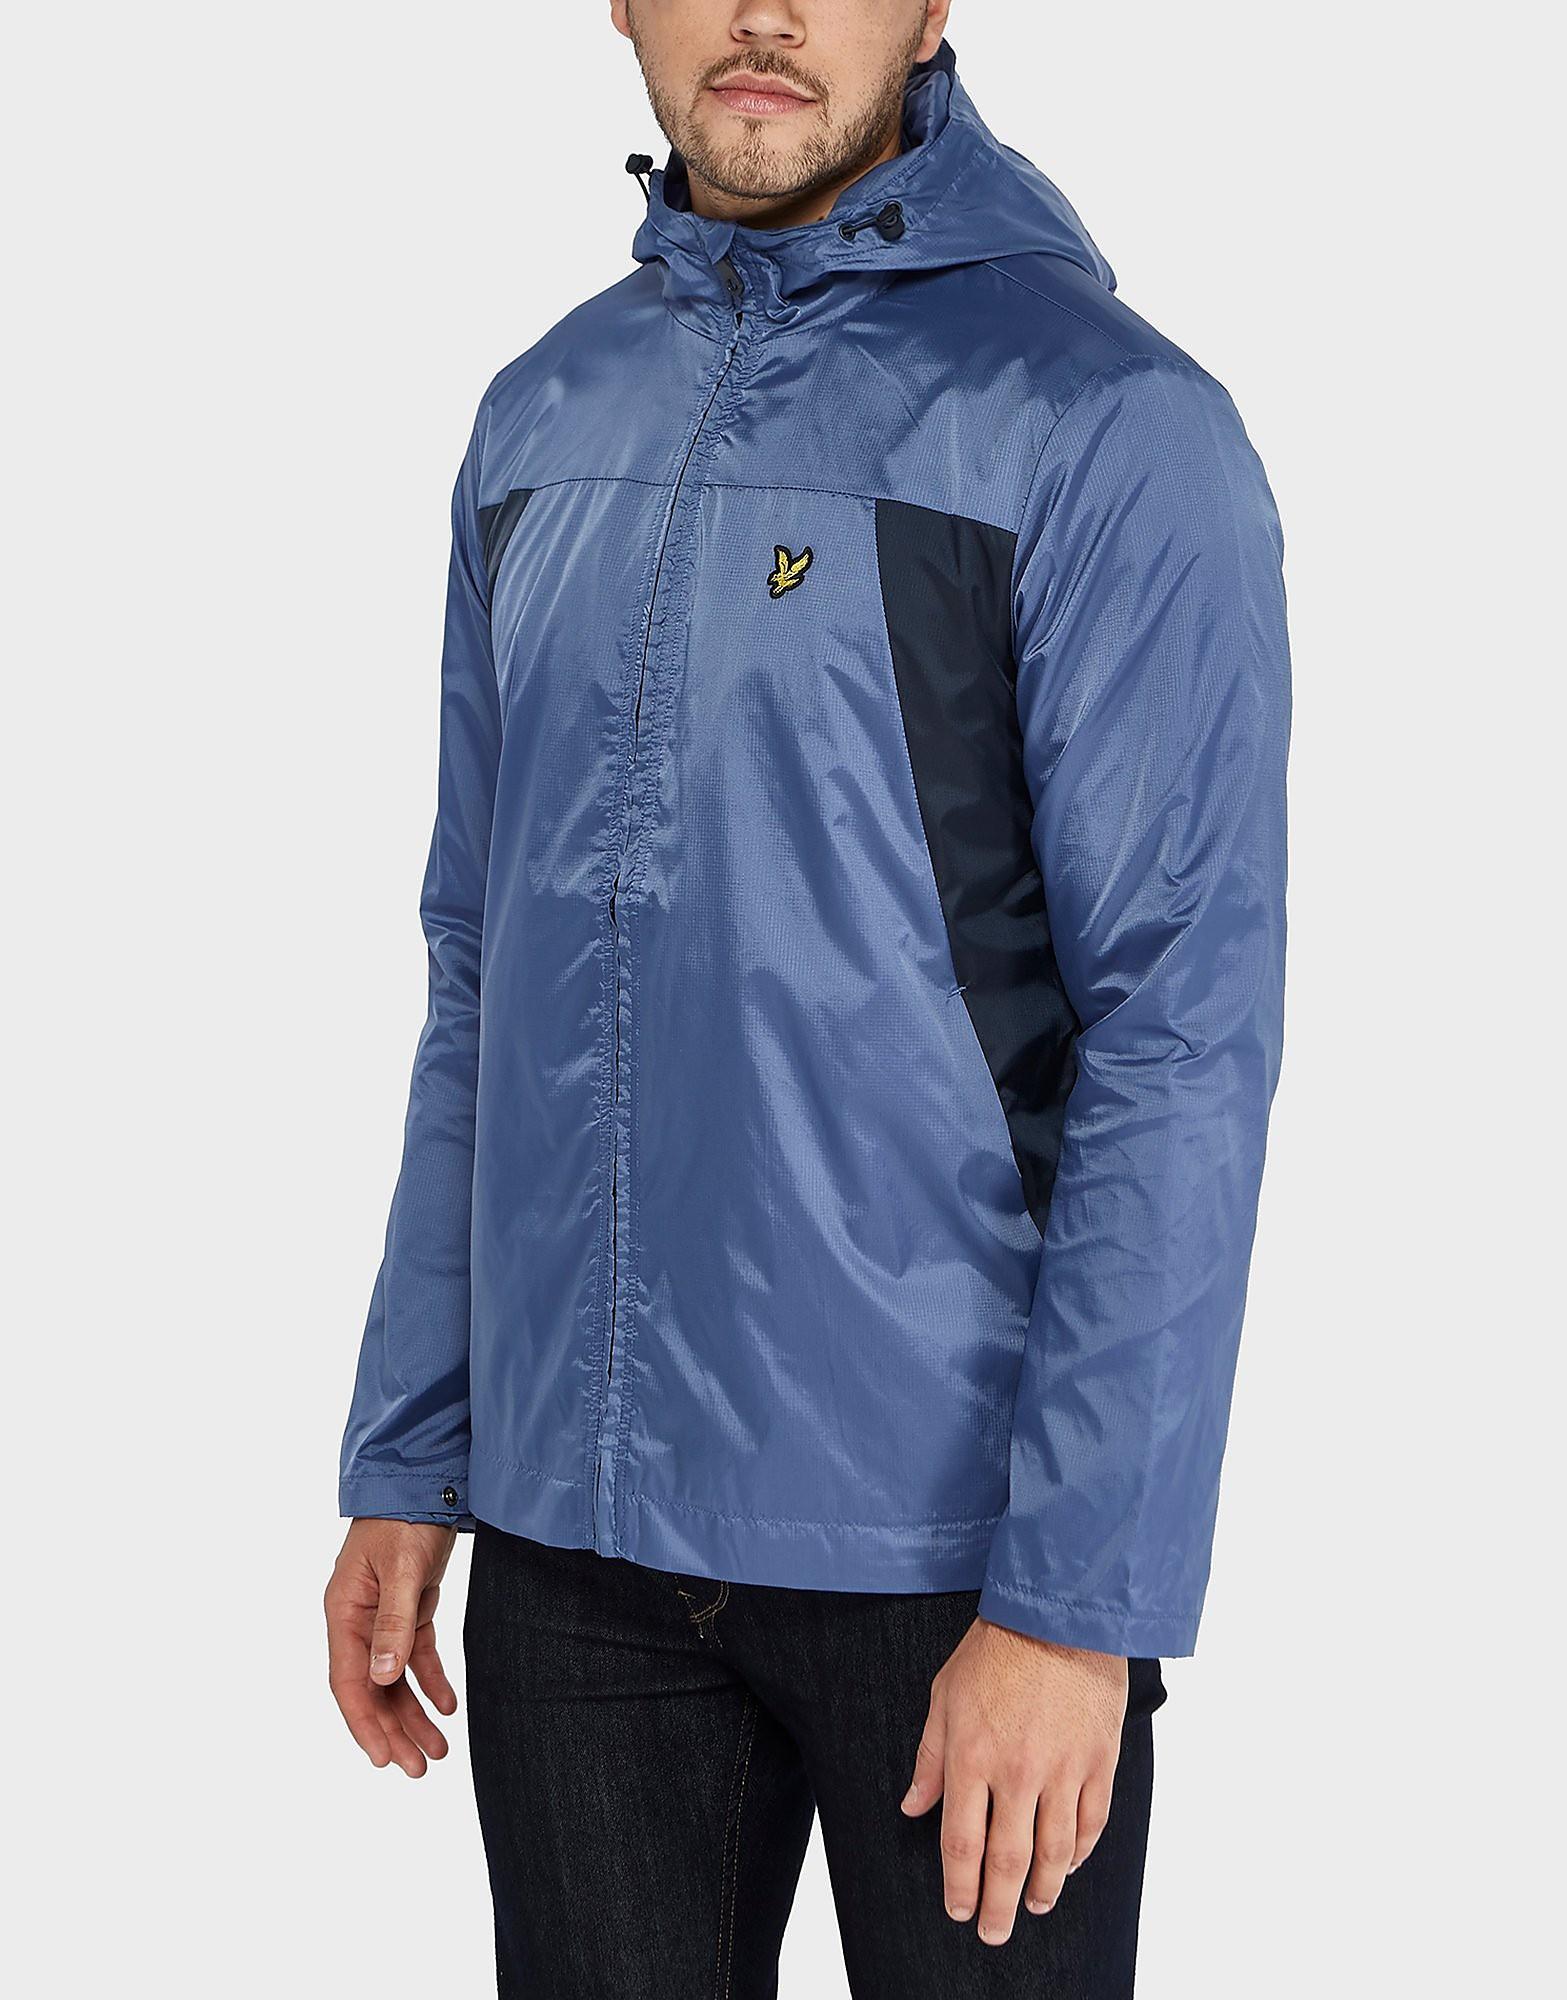 Lyle & Scott Lightweight Hooded Panel Jacket